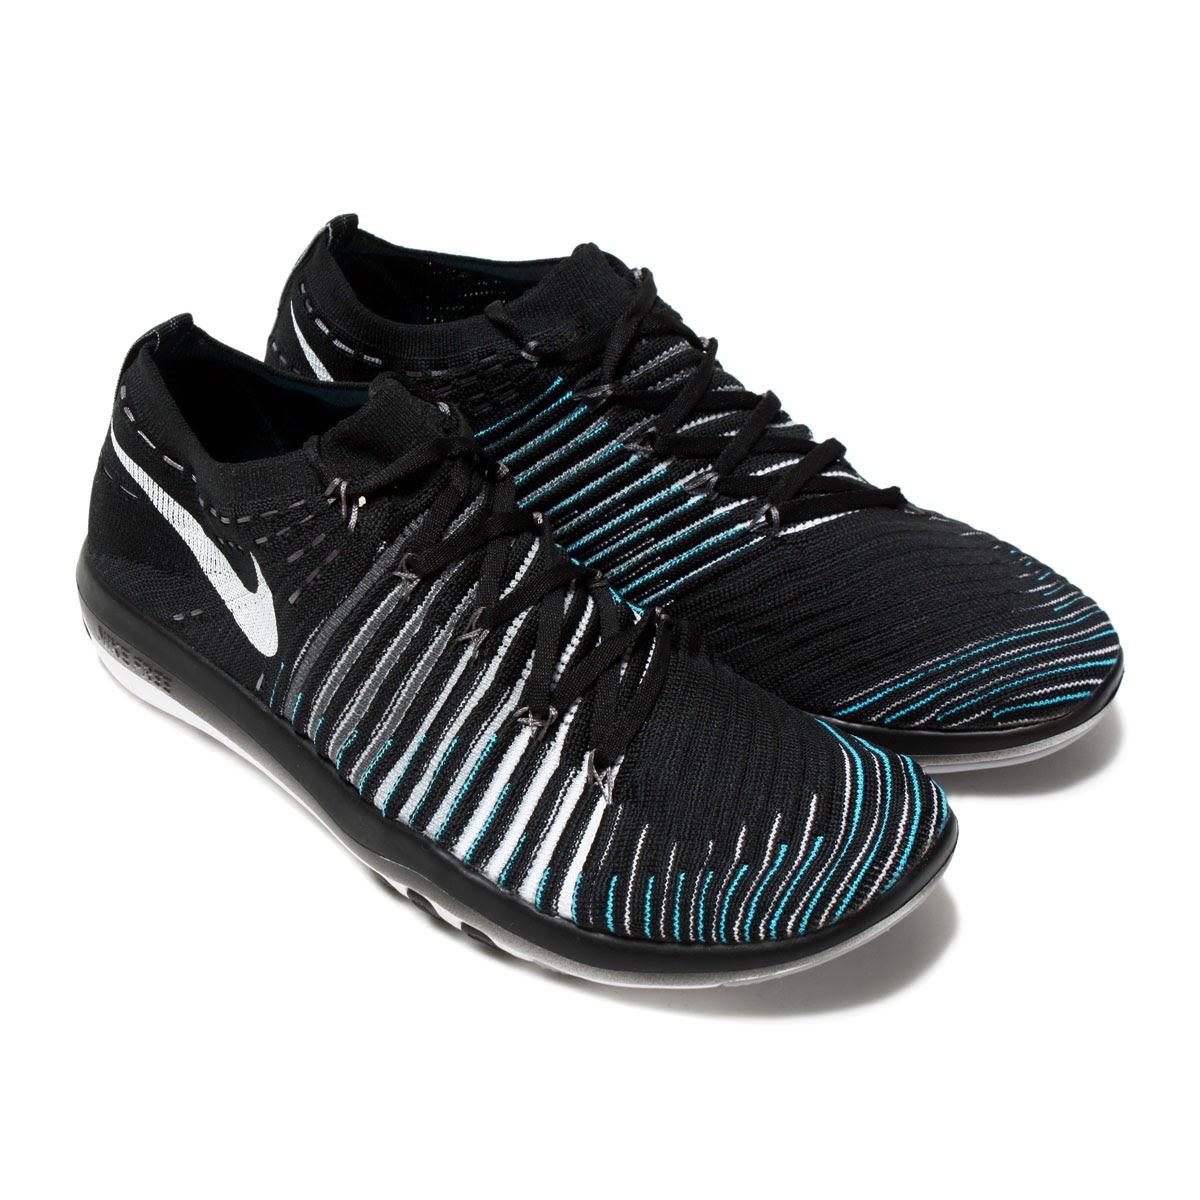 Nike Free Transform Flyknit WMNS Kicks Sneakers nike